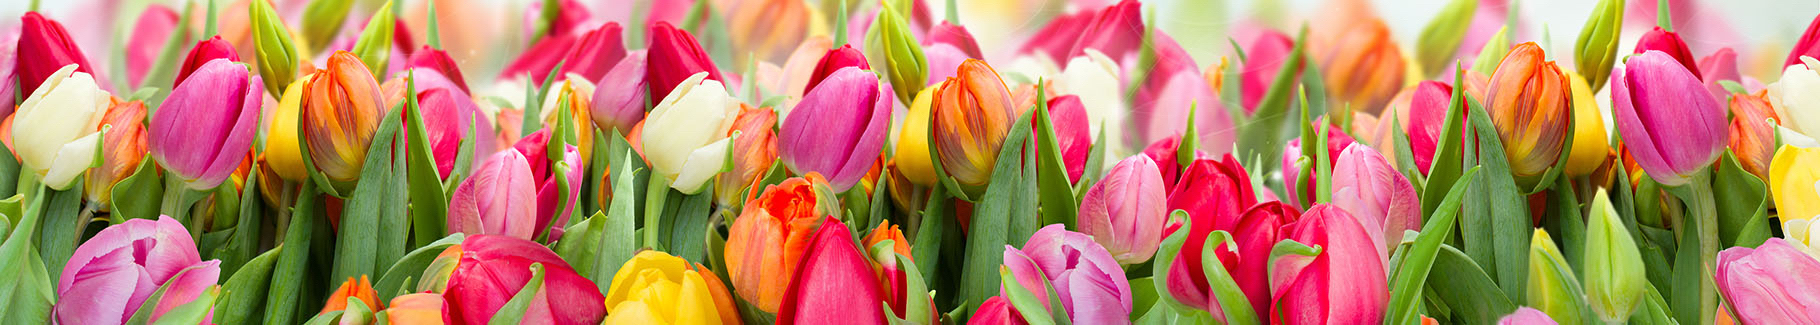 Fototapeta tulipany wielobarwne